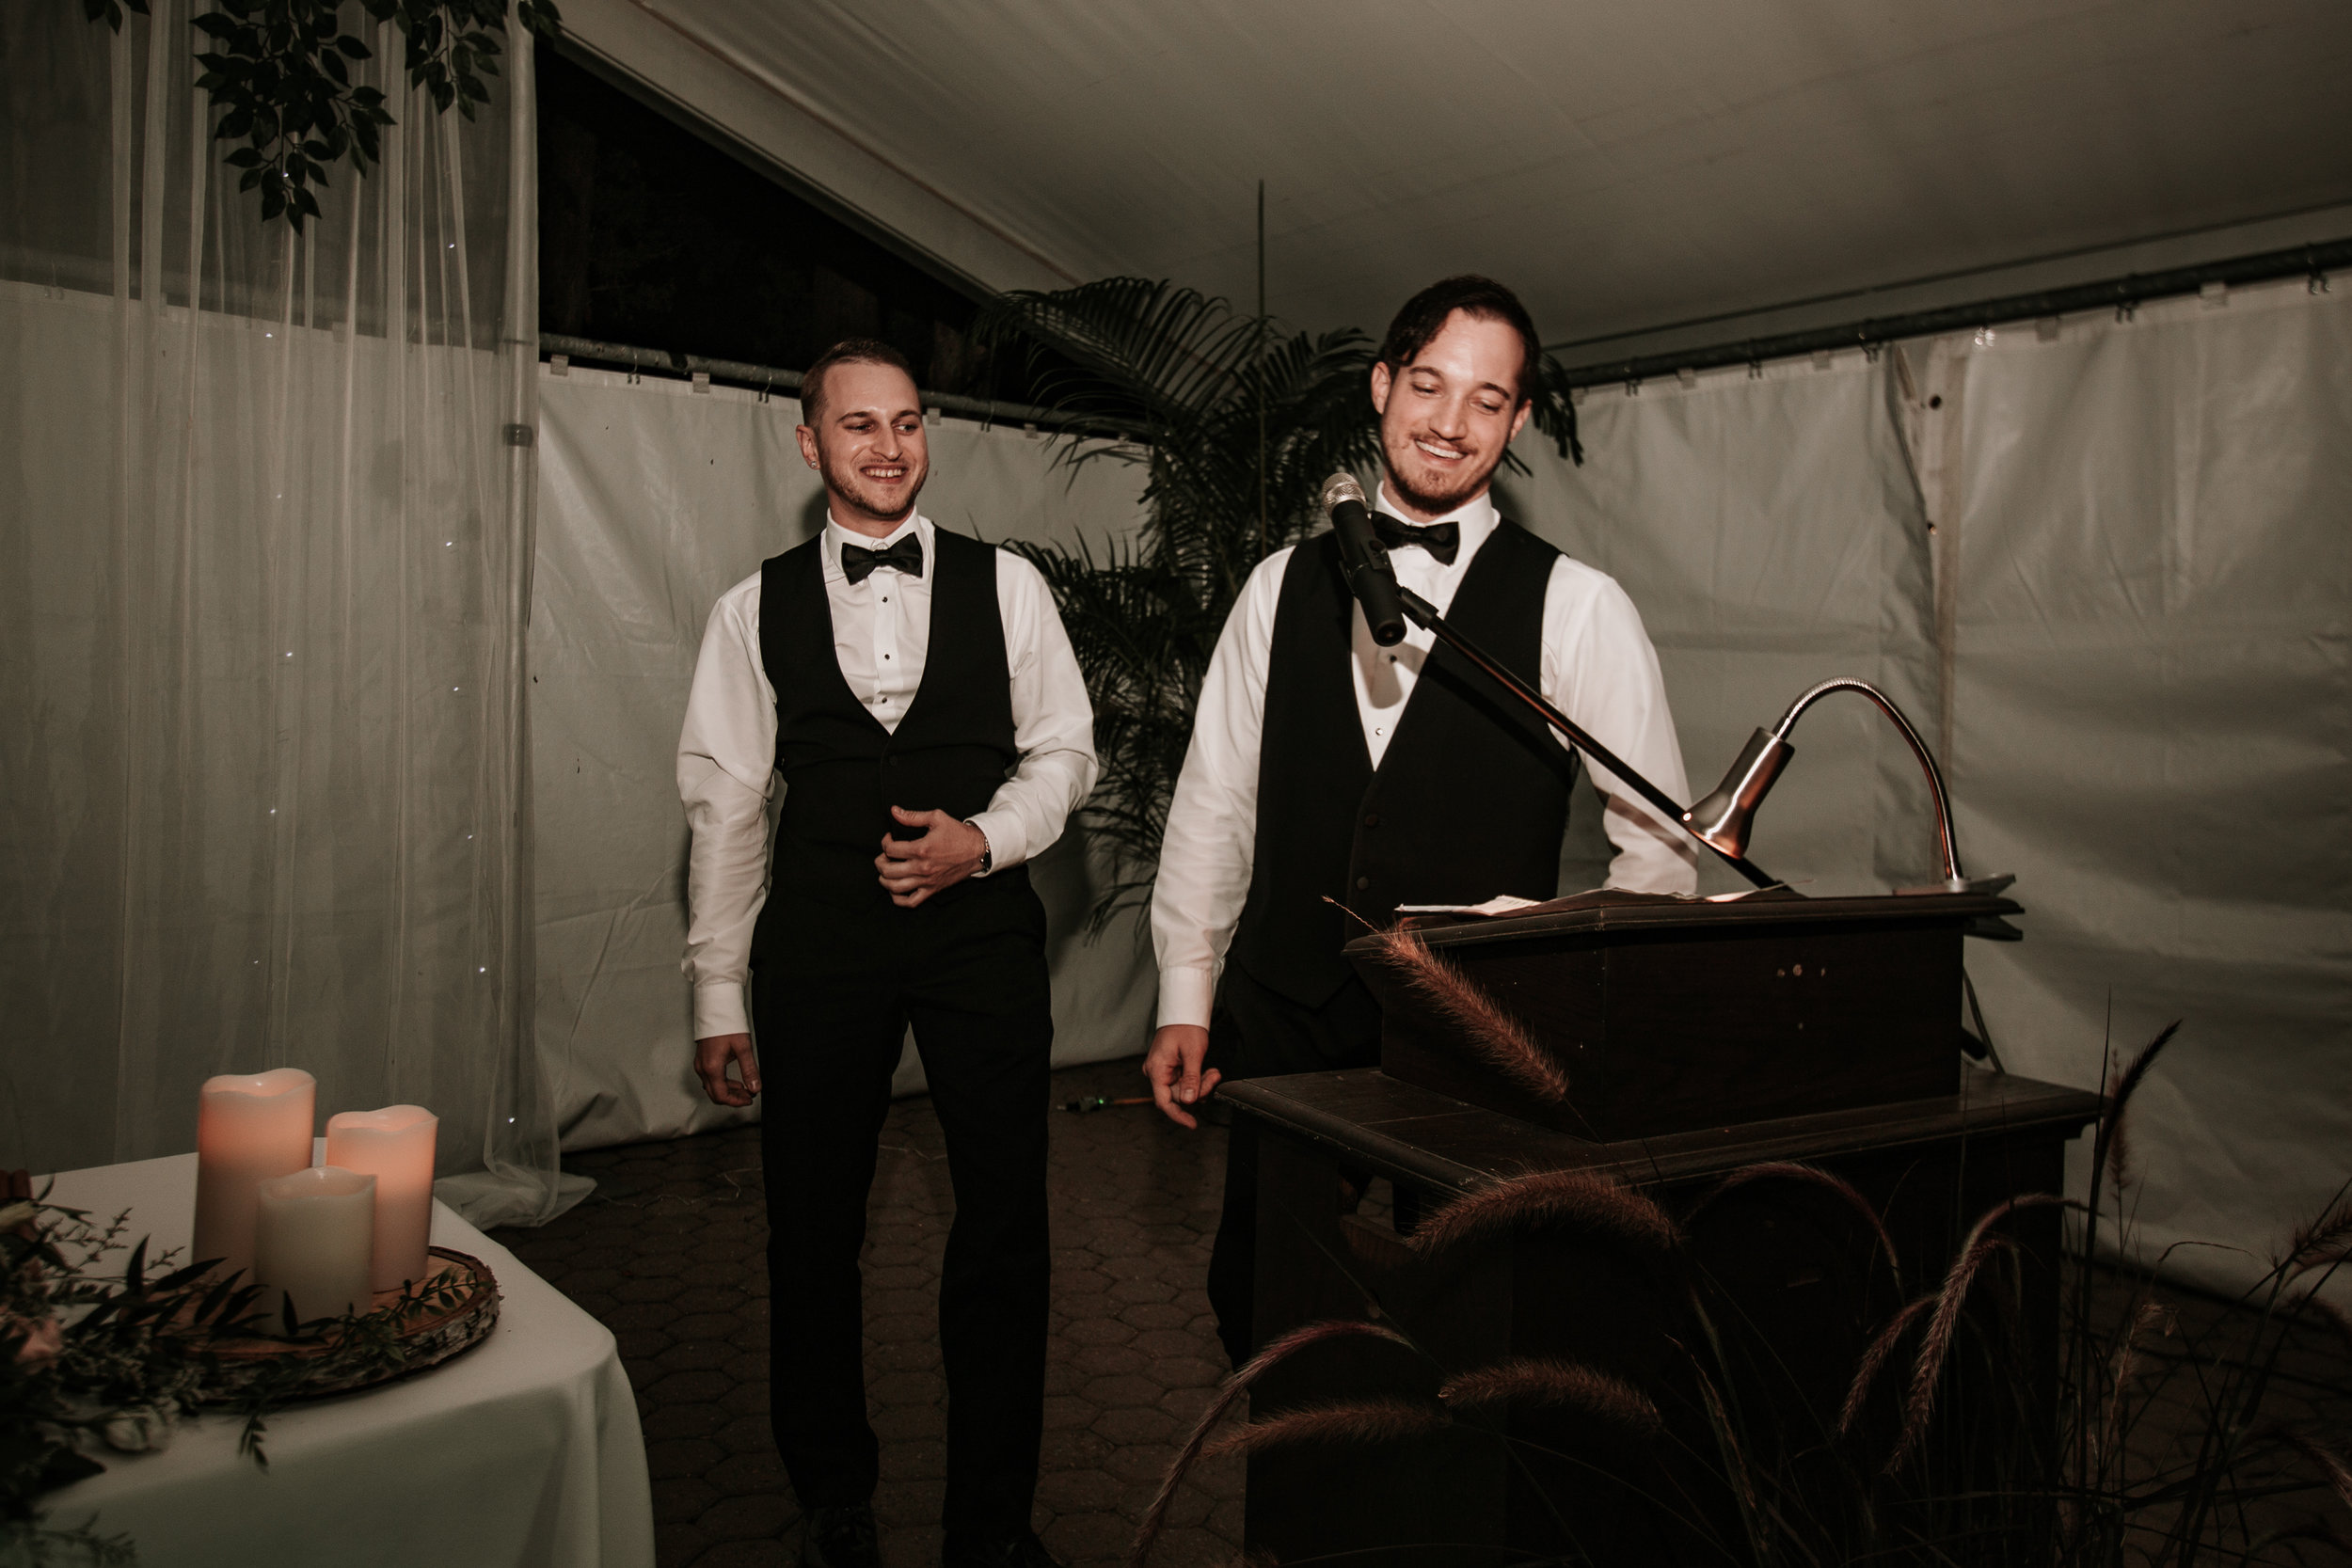 Claremont_fourseasons_Wedding-490.jpg